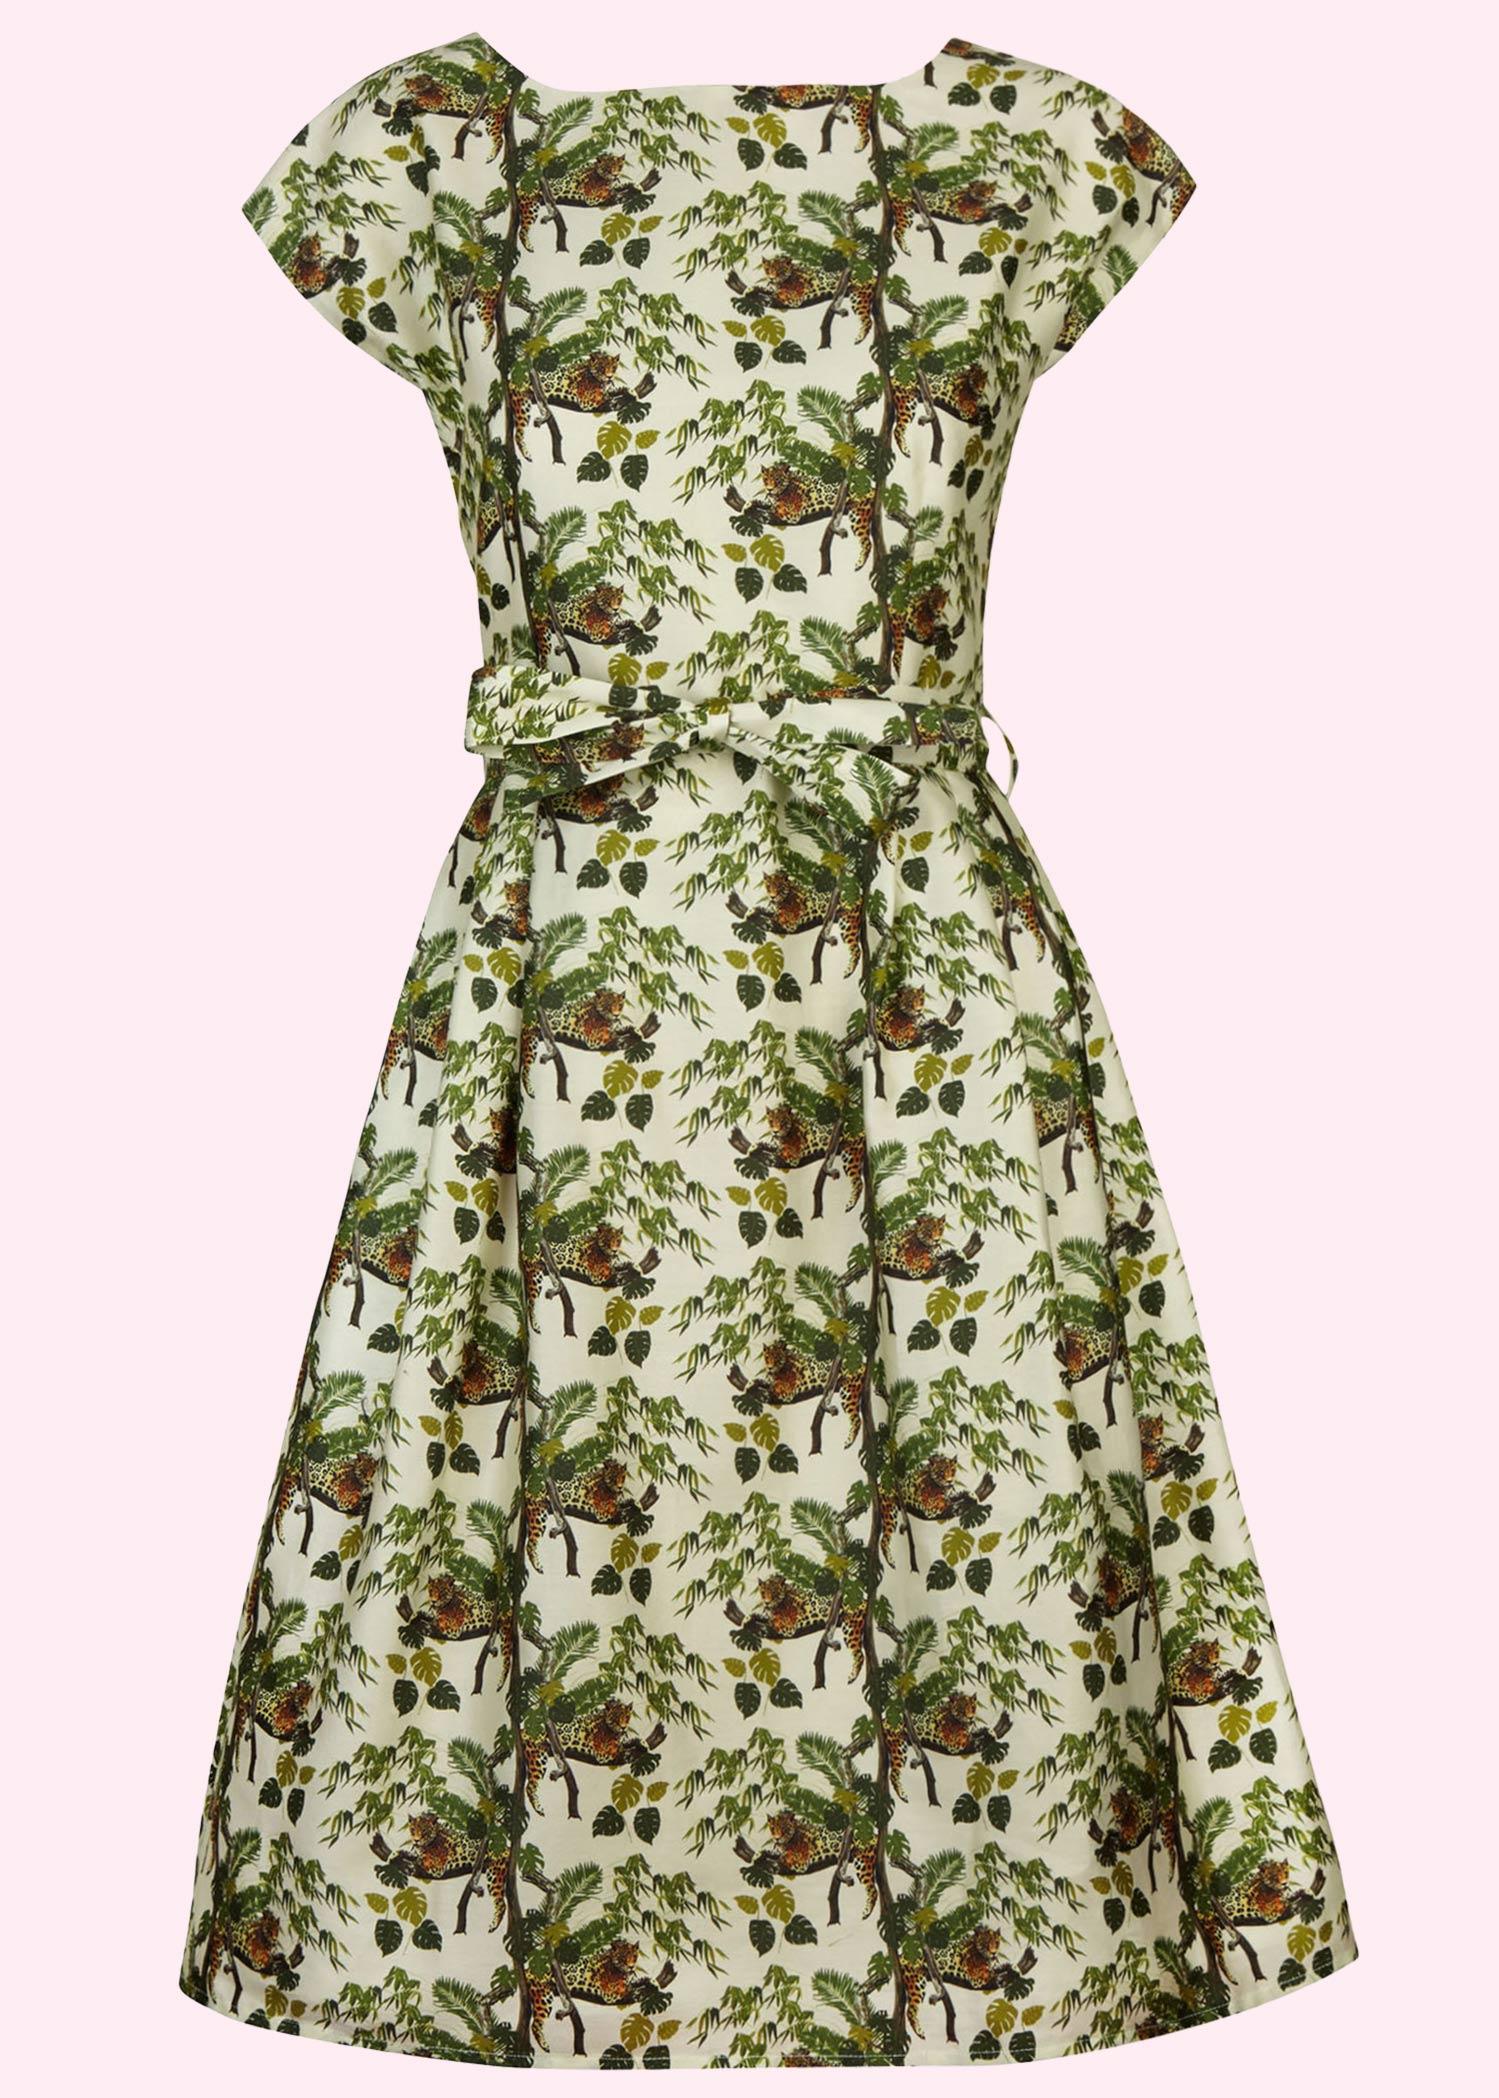 Beatrice sommer kjole i bomuld med leopard print fra Palava